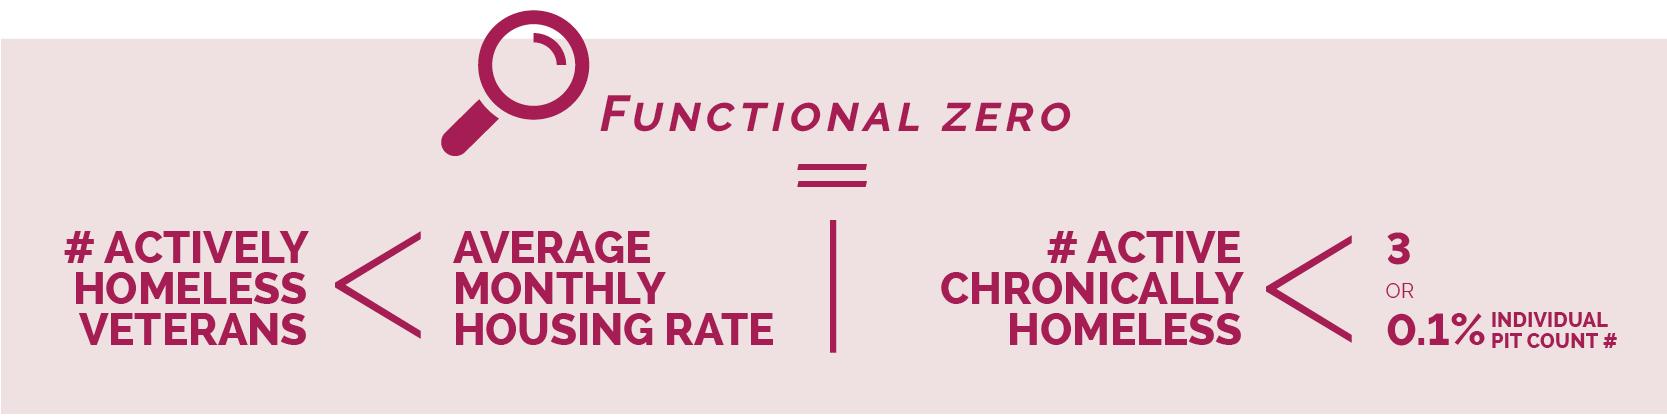 Functional zero definition.jpg